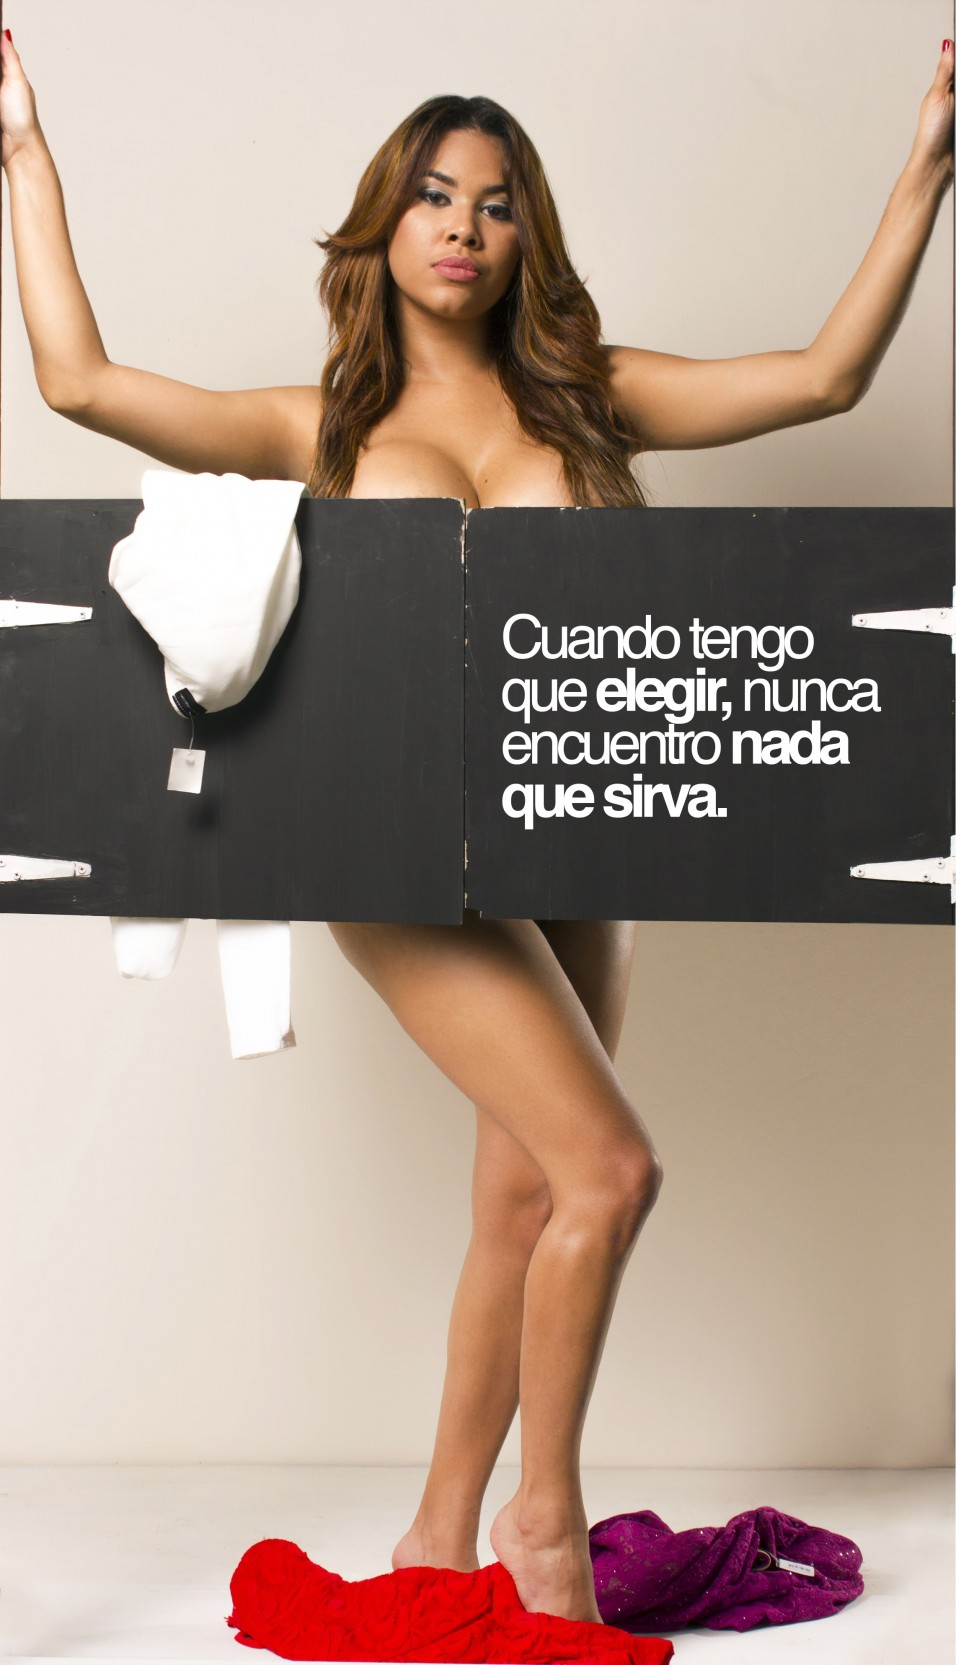 Presentadora Dominicana Se Desnuda Para Mostrar Cruda Realidad